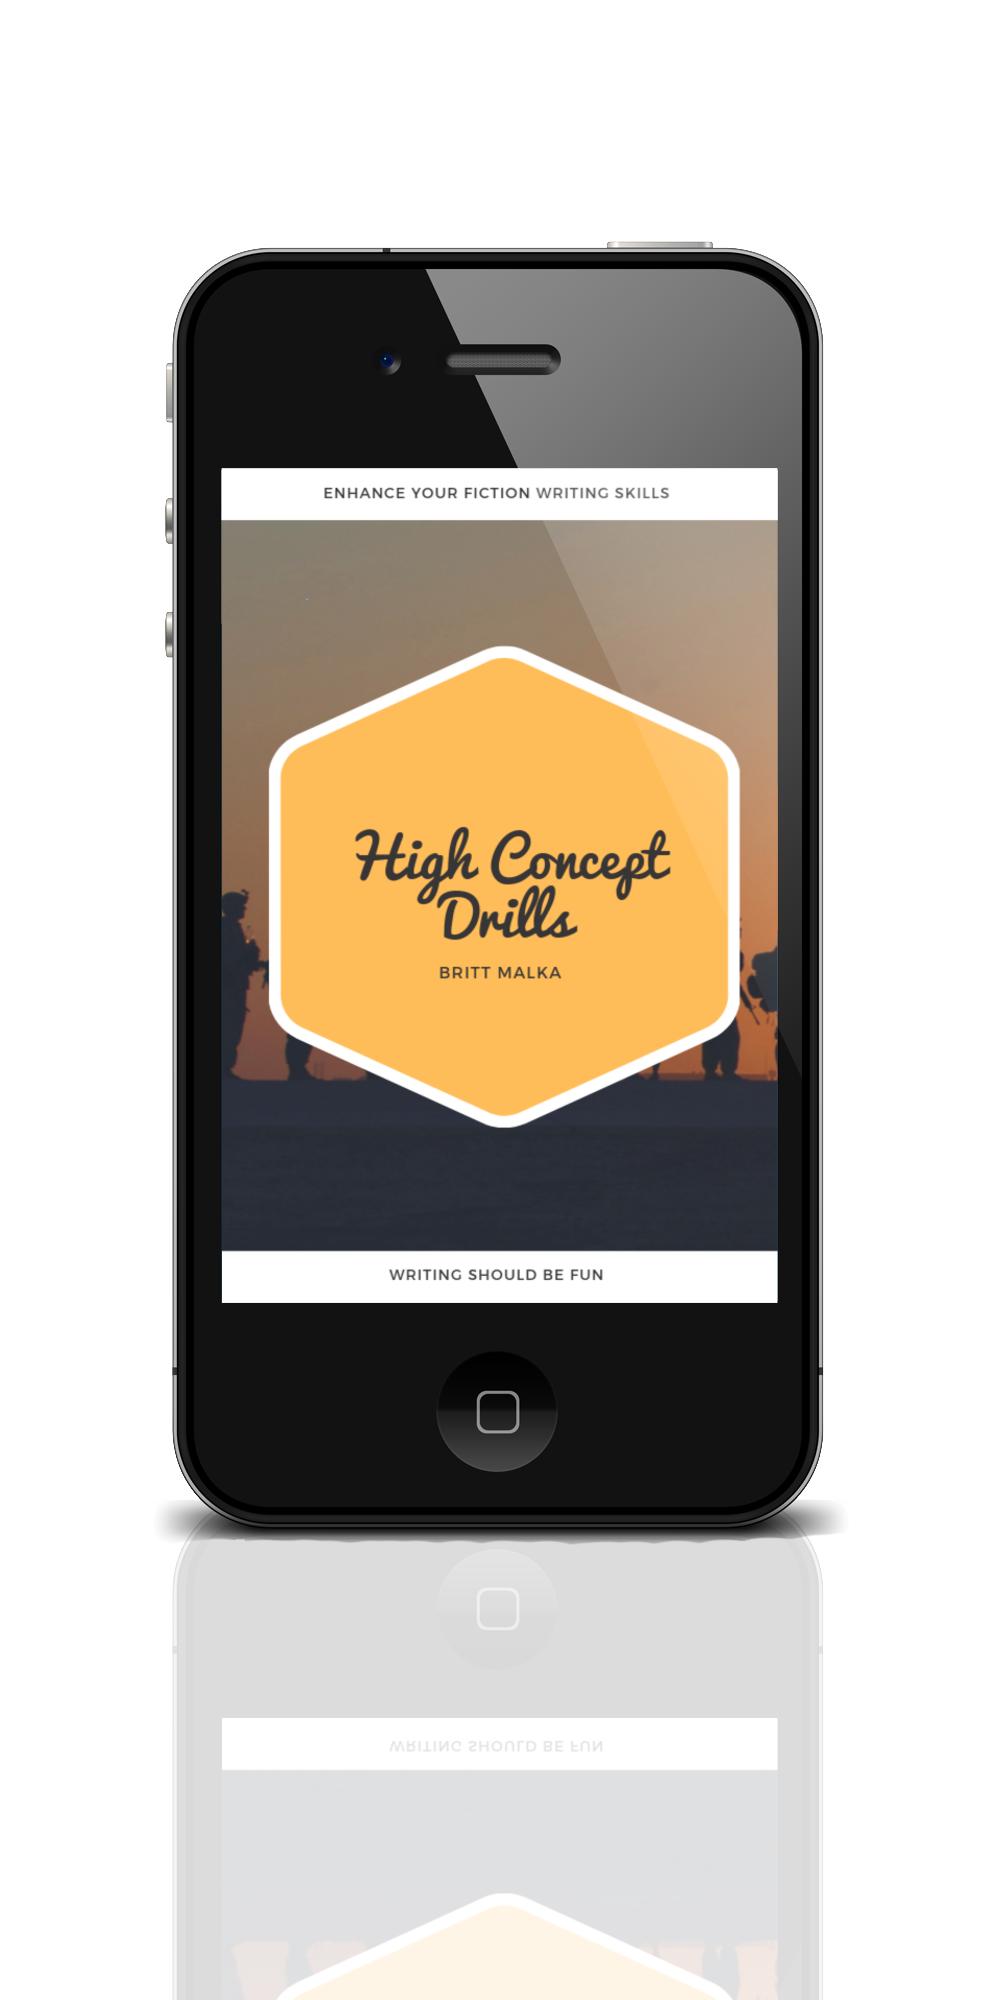 High Concept Drills